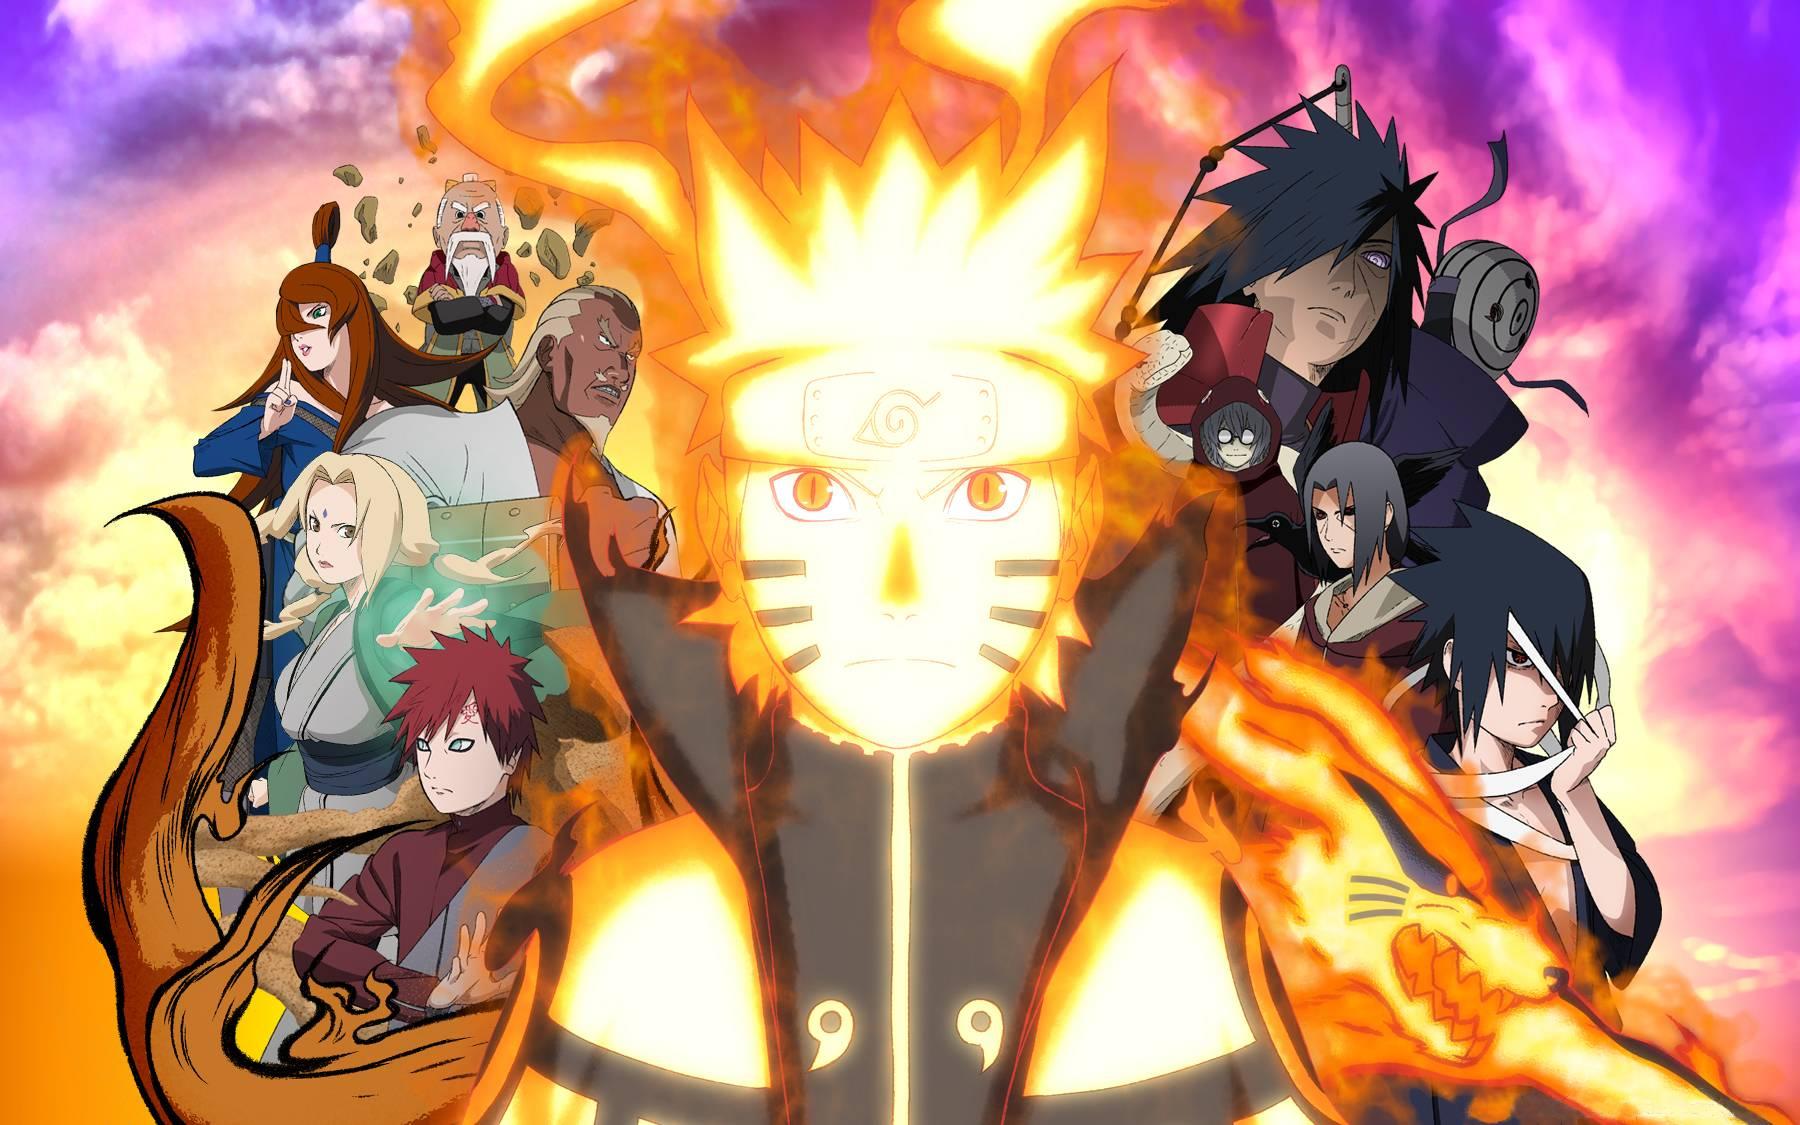 Wonderful Wallpaper High Quality Naruto - tR1aTun  Perfect Image Reference_115418.jpg